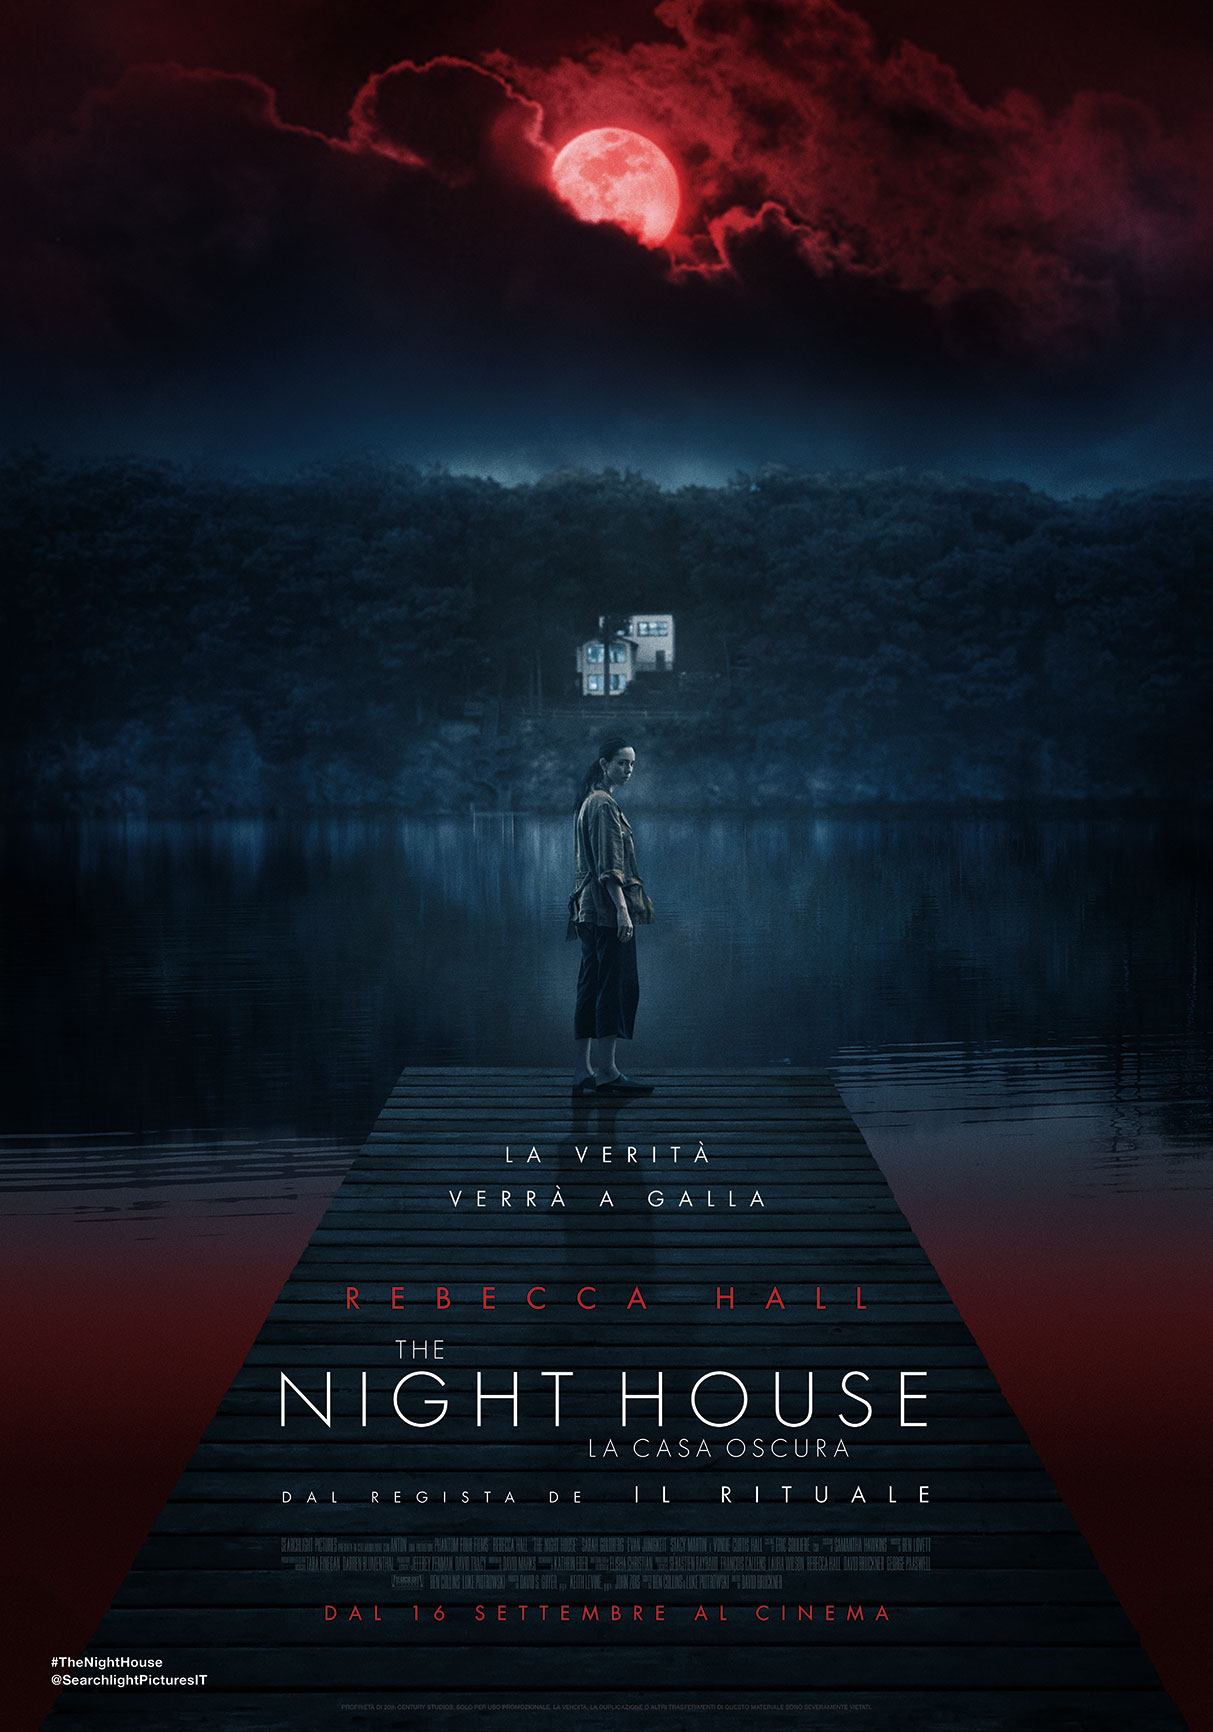 The Night House – La Casa Oscura